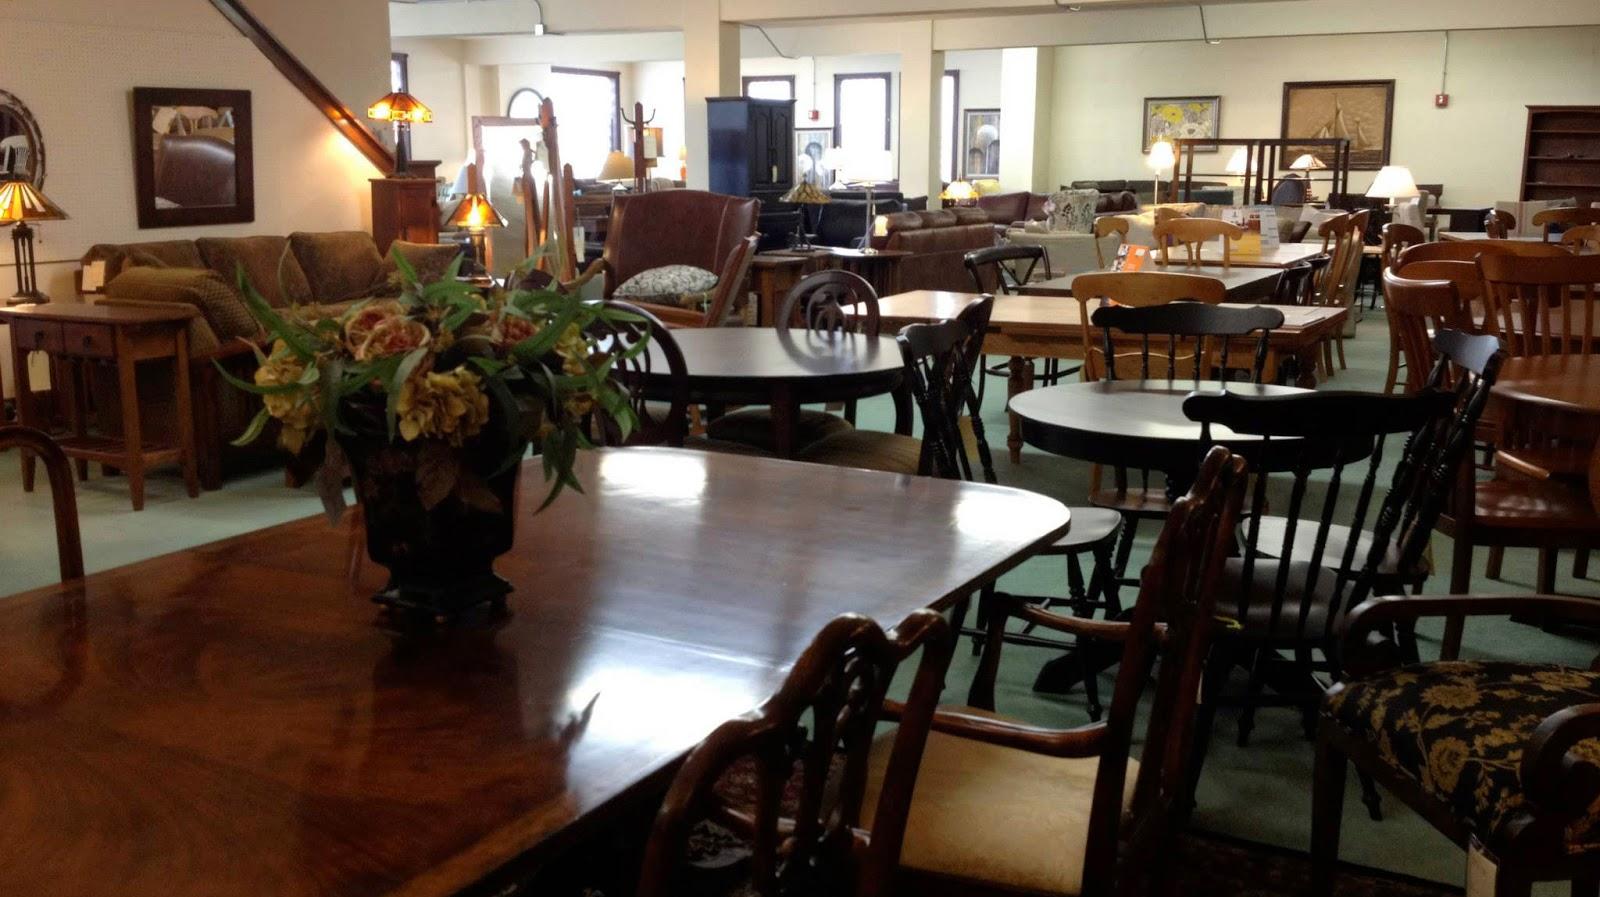 Choosing the Best Furniture Store My Home Design 1600x897